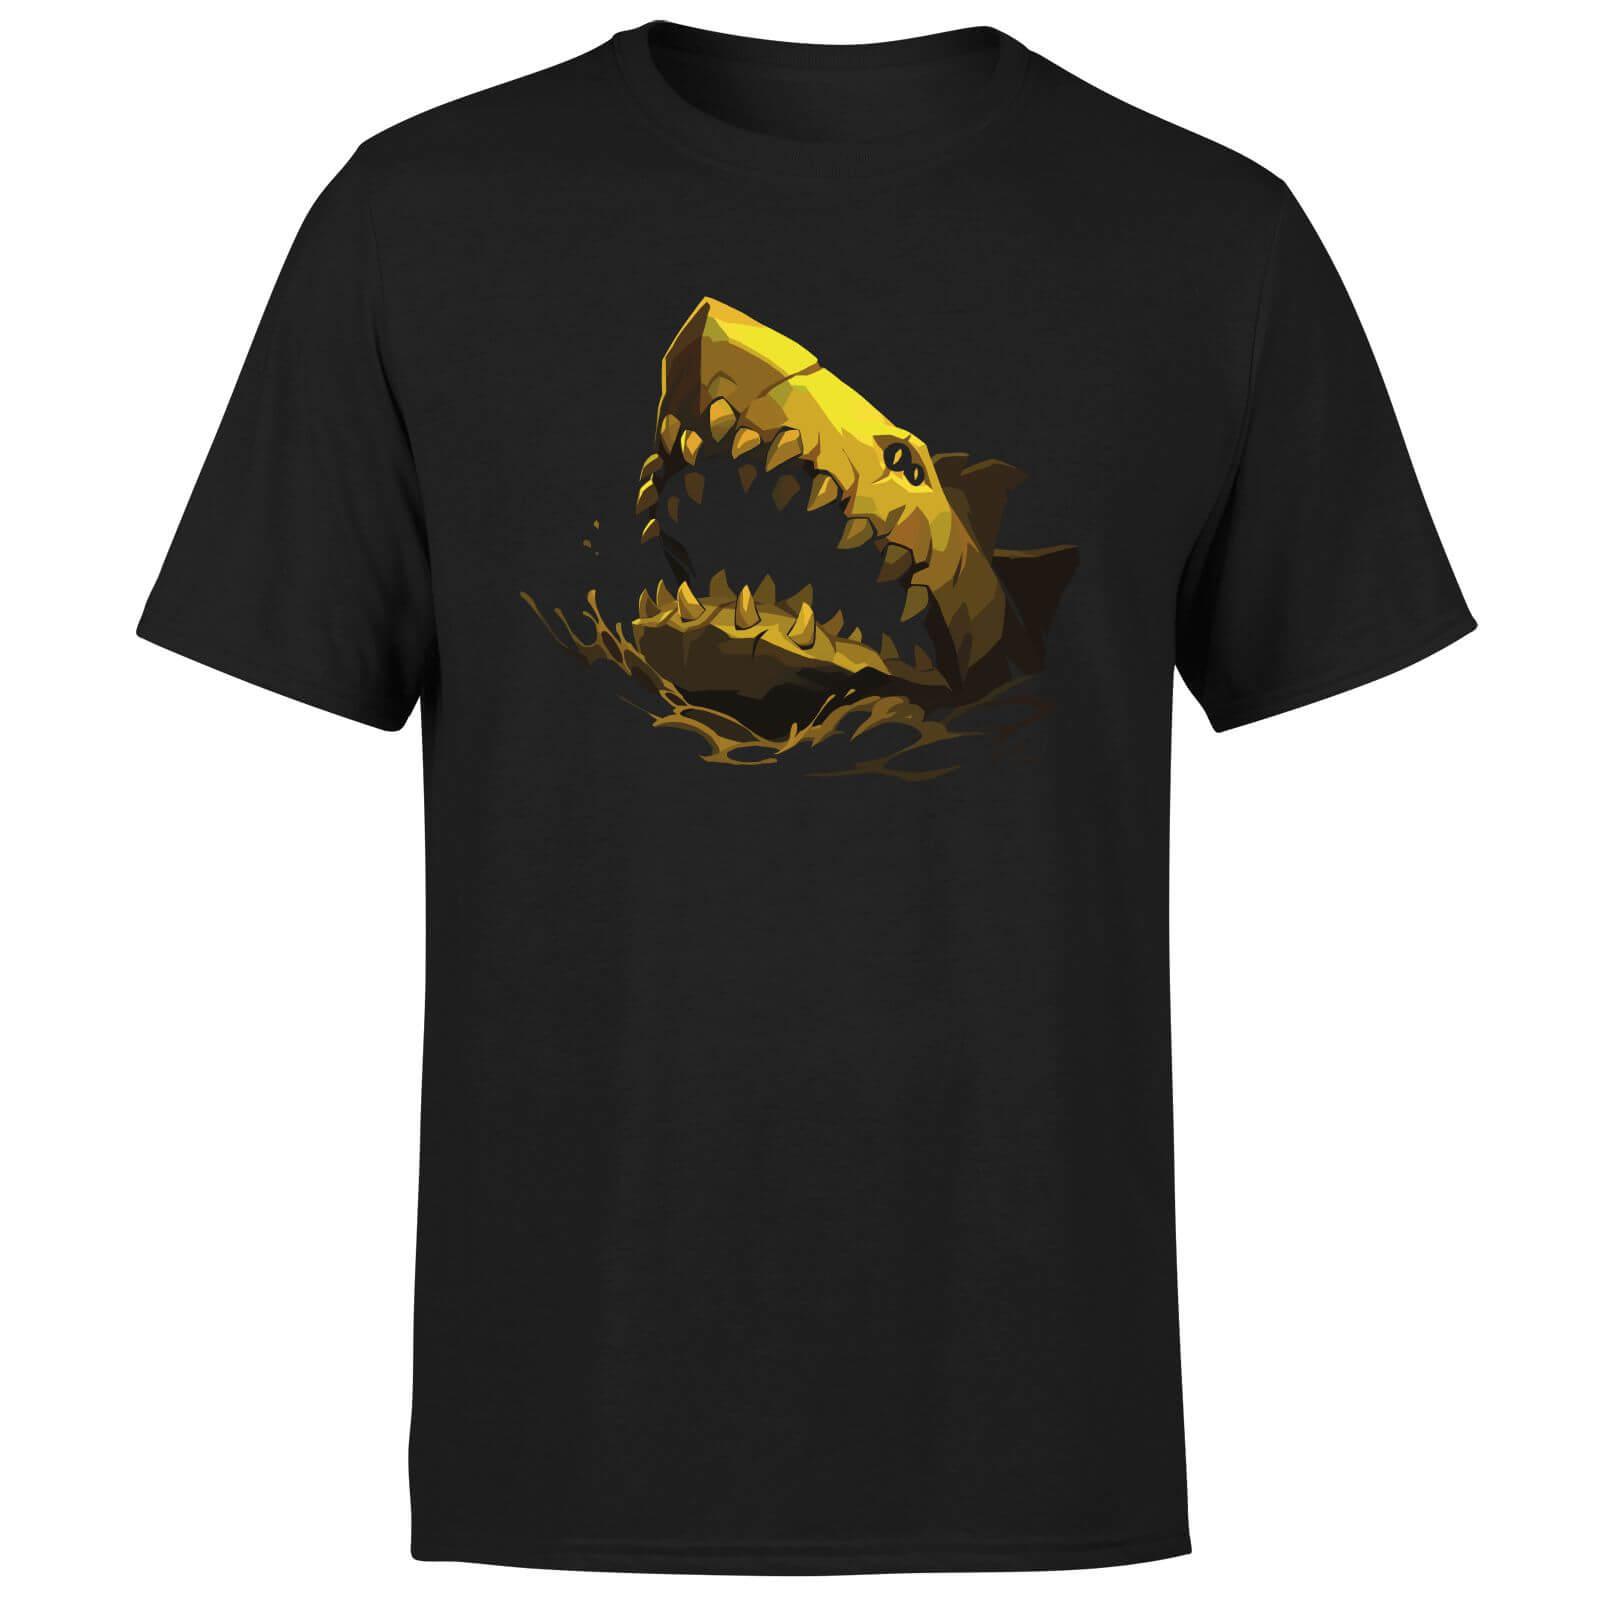 Sea of Thieves Gilded Megalodon T-Shirt - Black - XL - Black